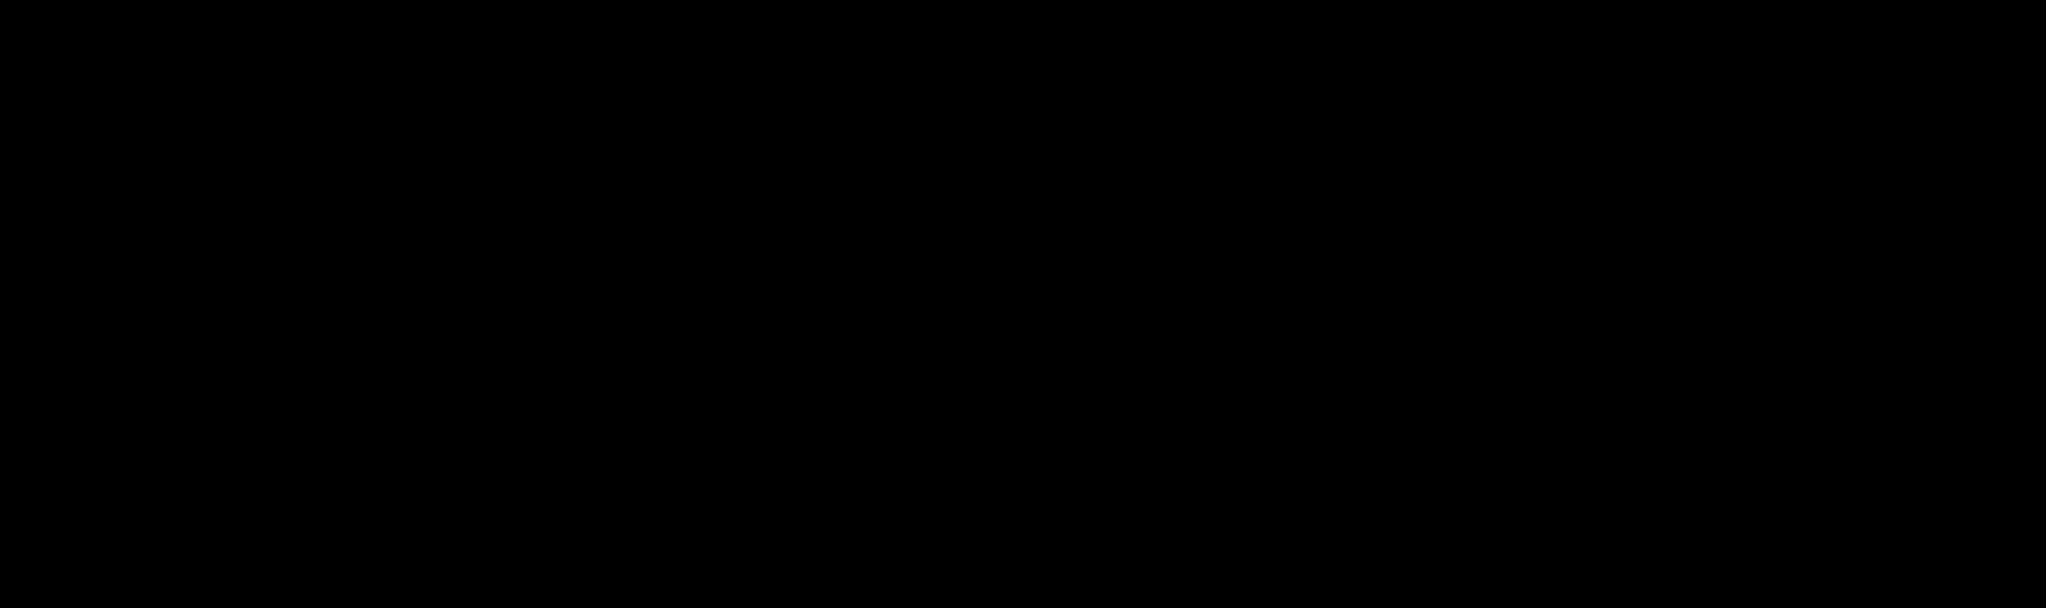 pih-logo1